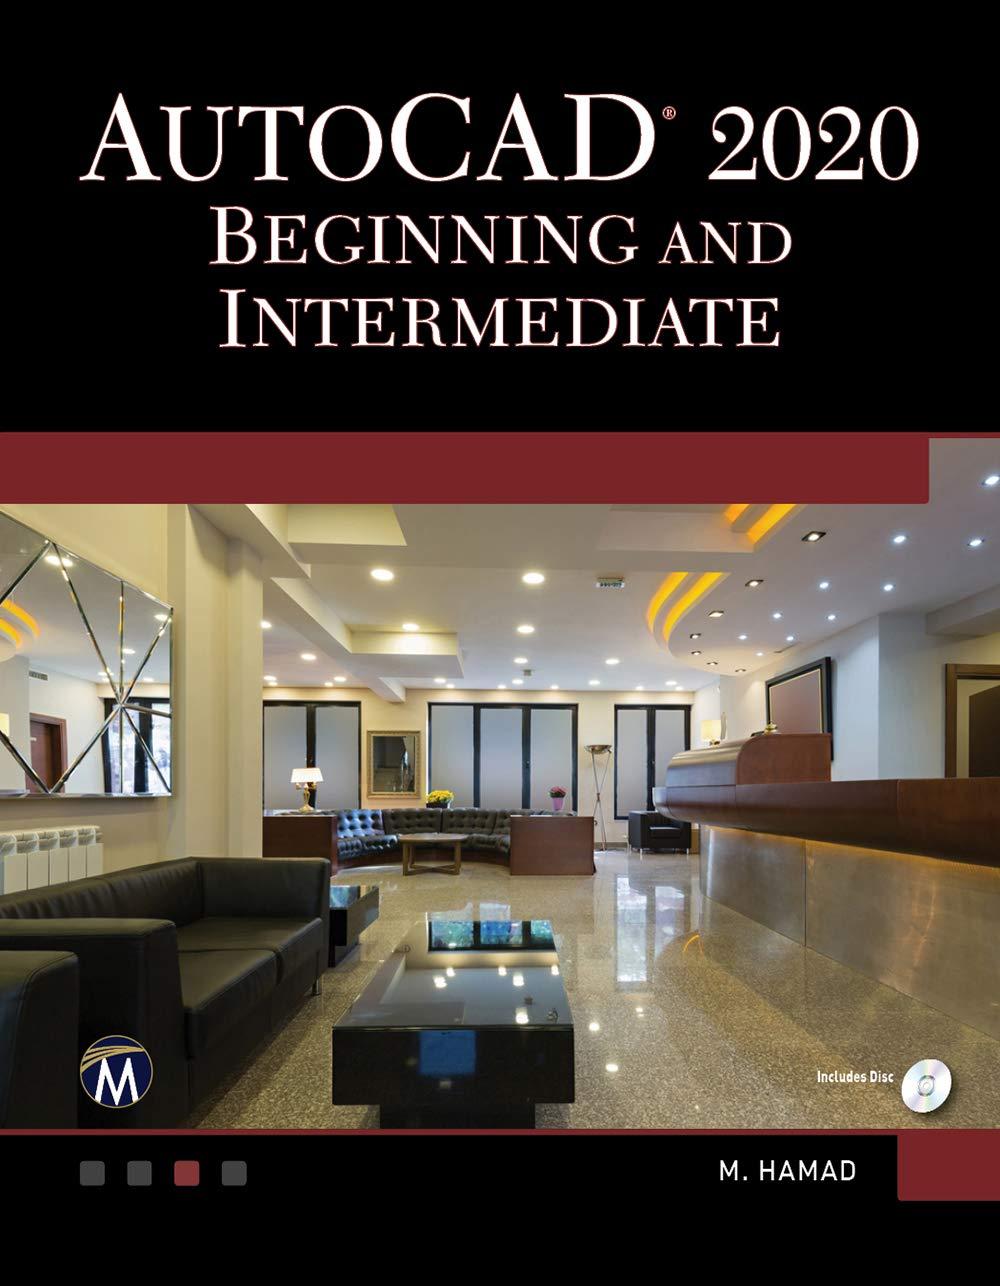 AutoCAD 2020 Beginning and Intermediate: Amazon.es: Hamad, Munir: Libros en idiomas extranjeros